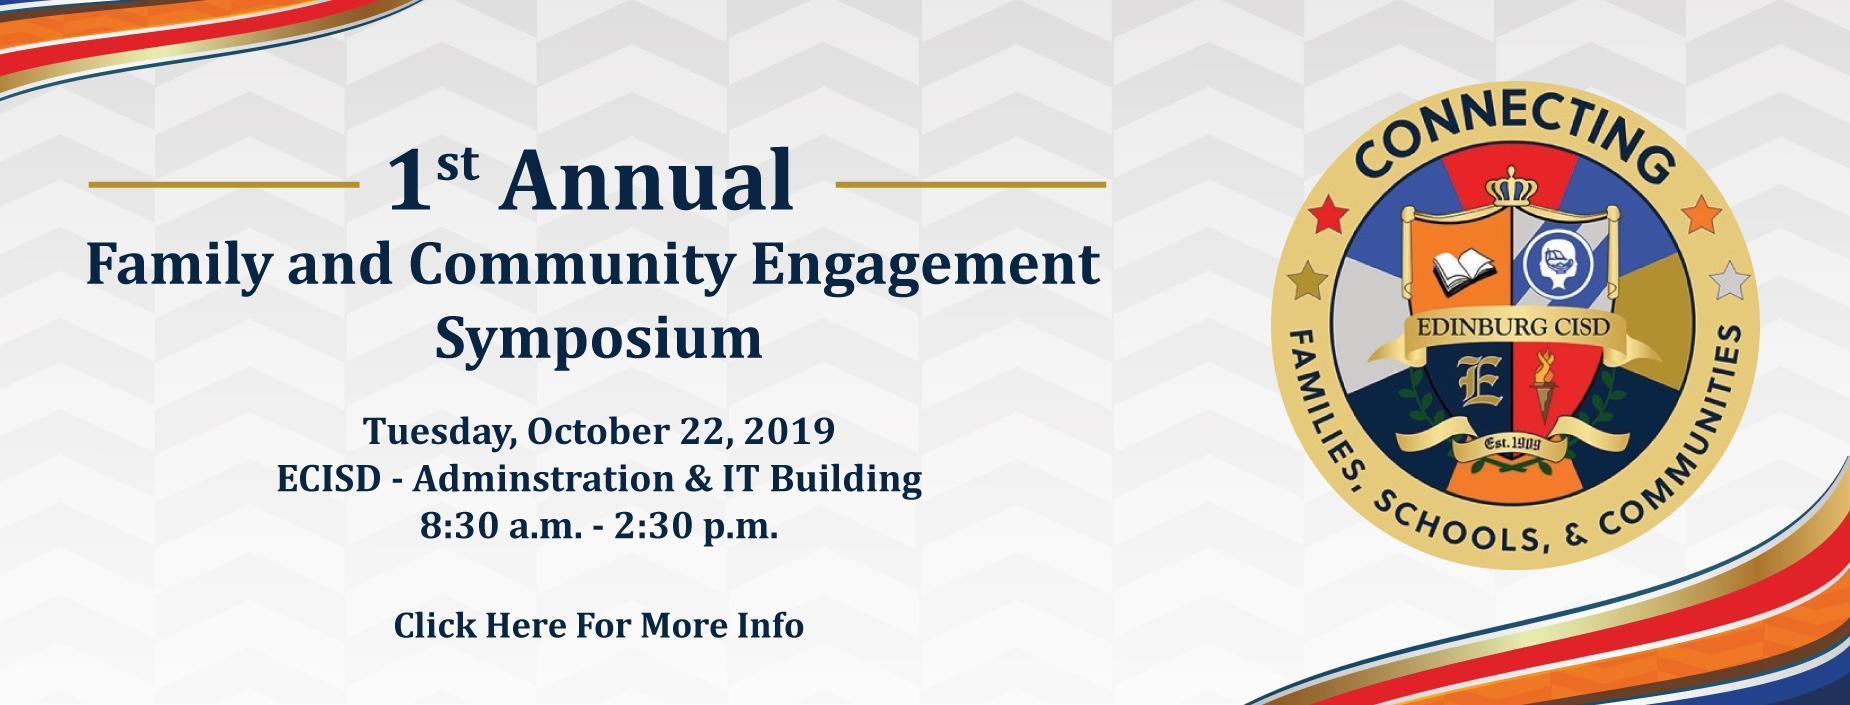 2019 Symposium Banner